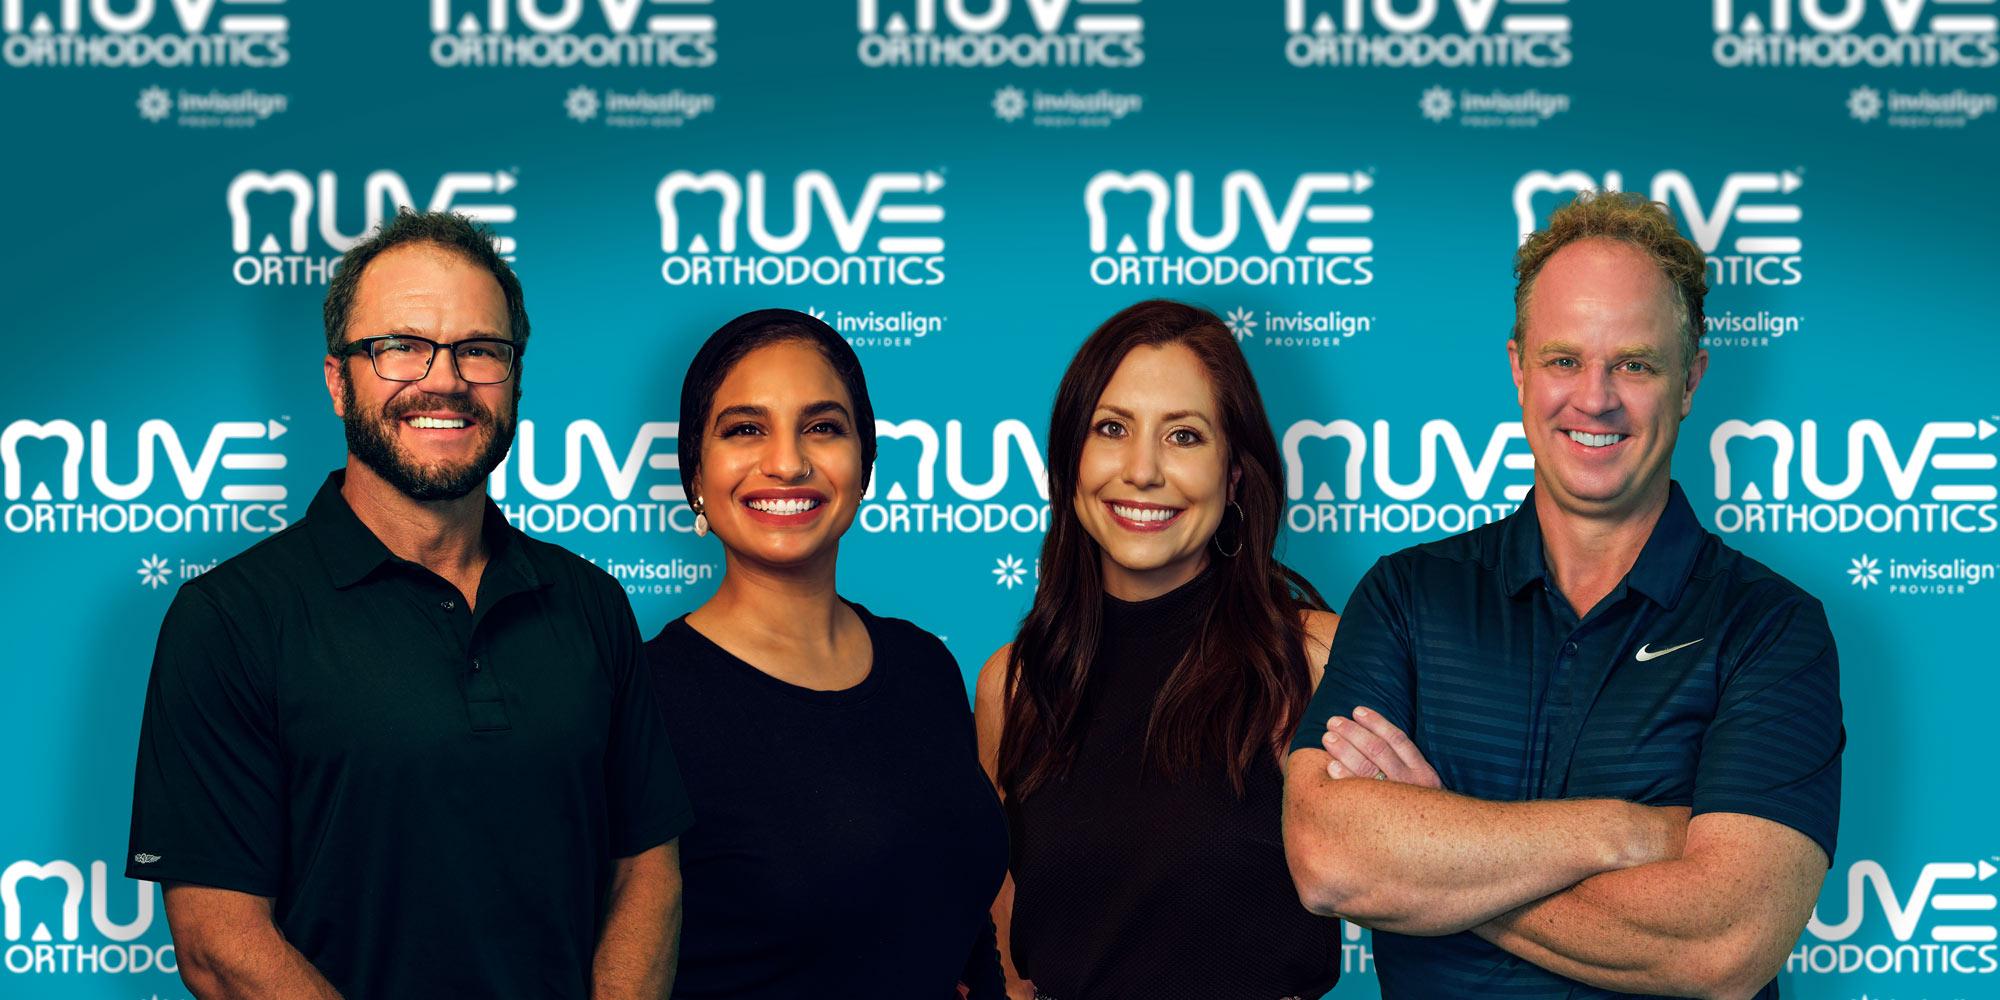 Muve Orthodontics Staff